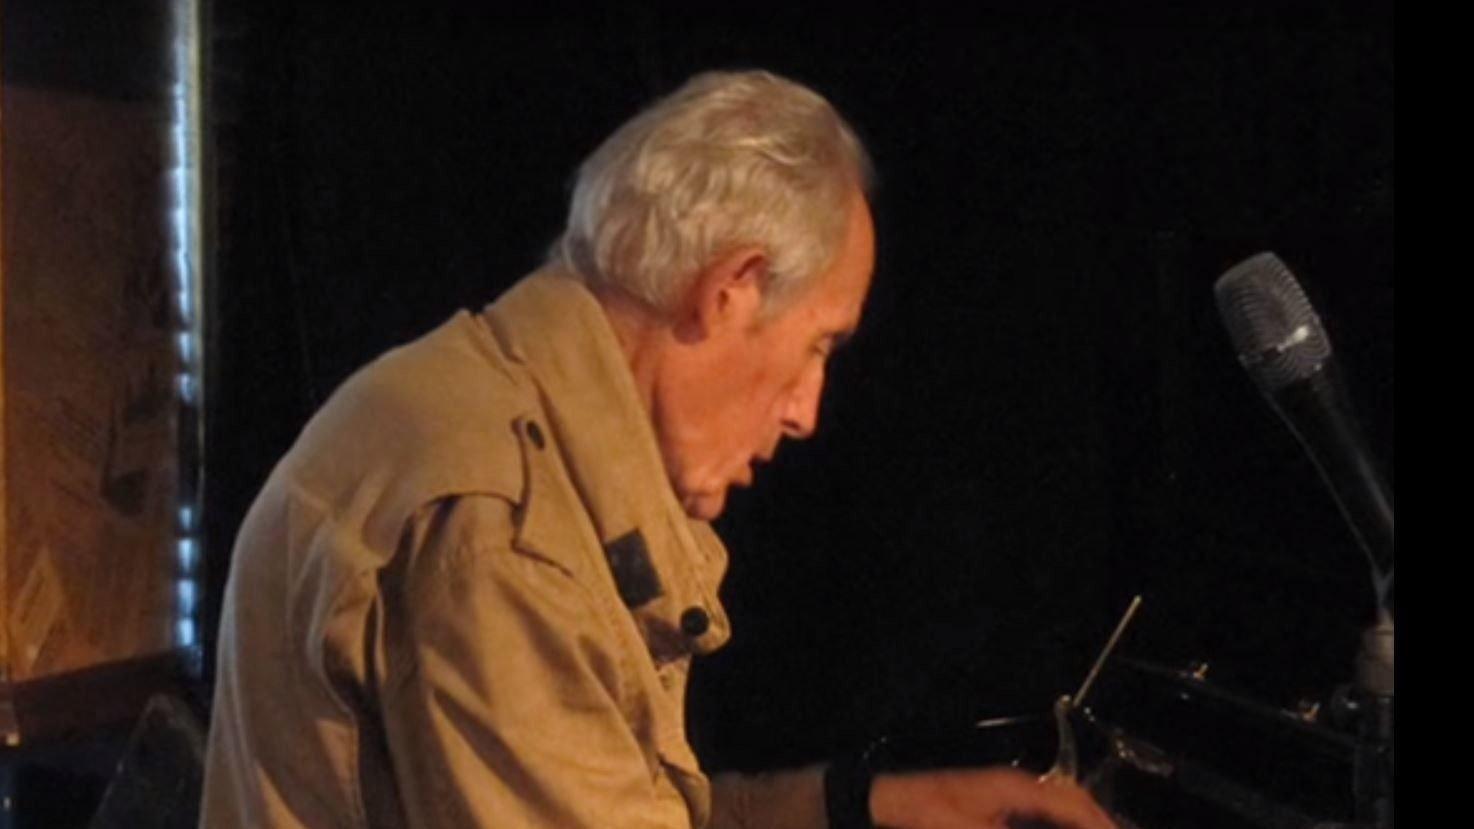 JAZZLEGENDE: Einar «Pastor'n » Iversen er død, 88 år gammel. Iversen regnes som en av Norges fremste pianister og jazzmusikere. Her fra en privat konsert i 1998.